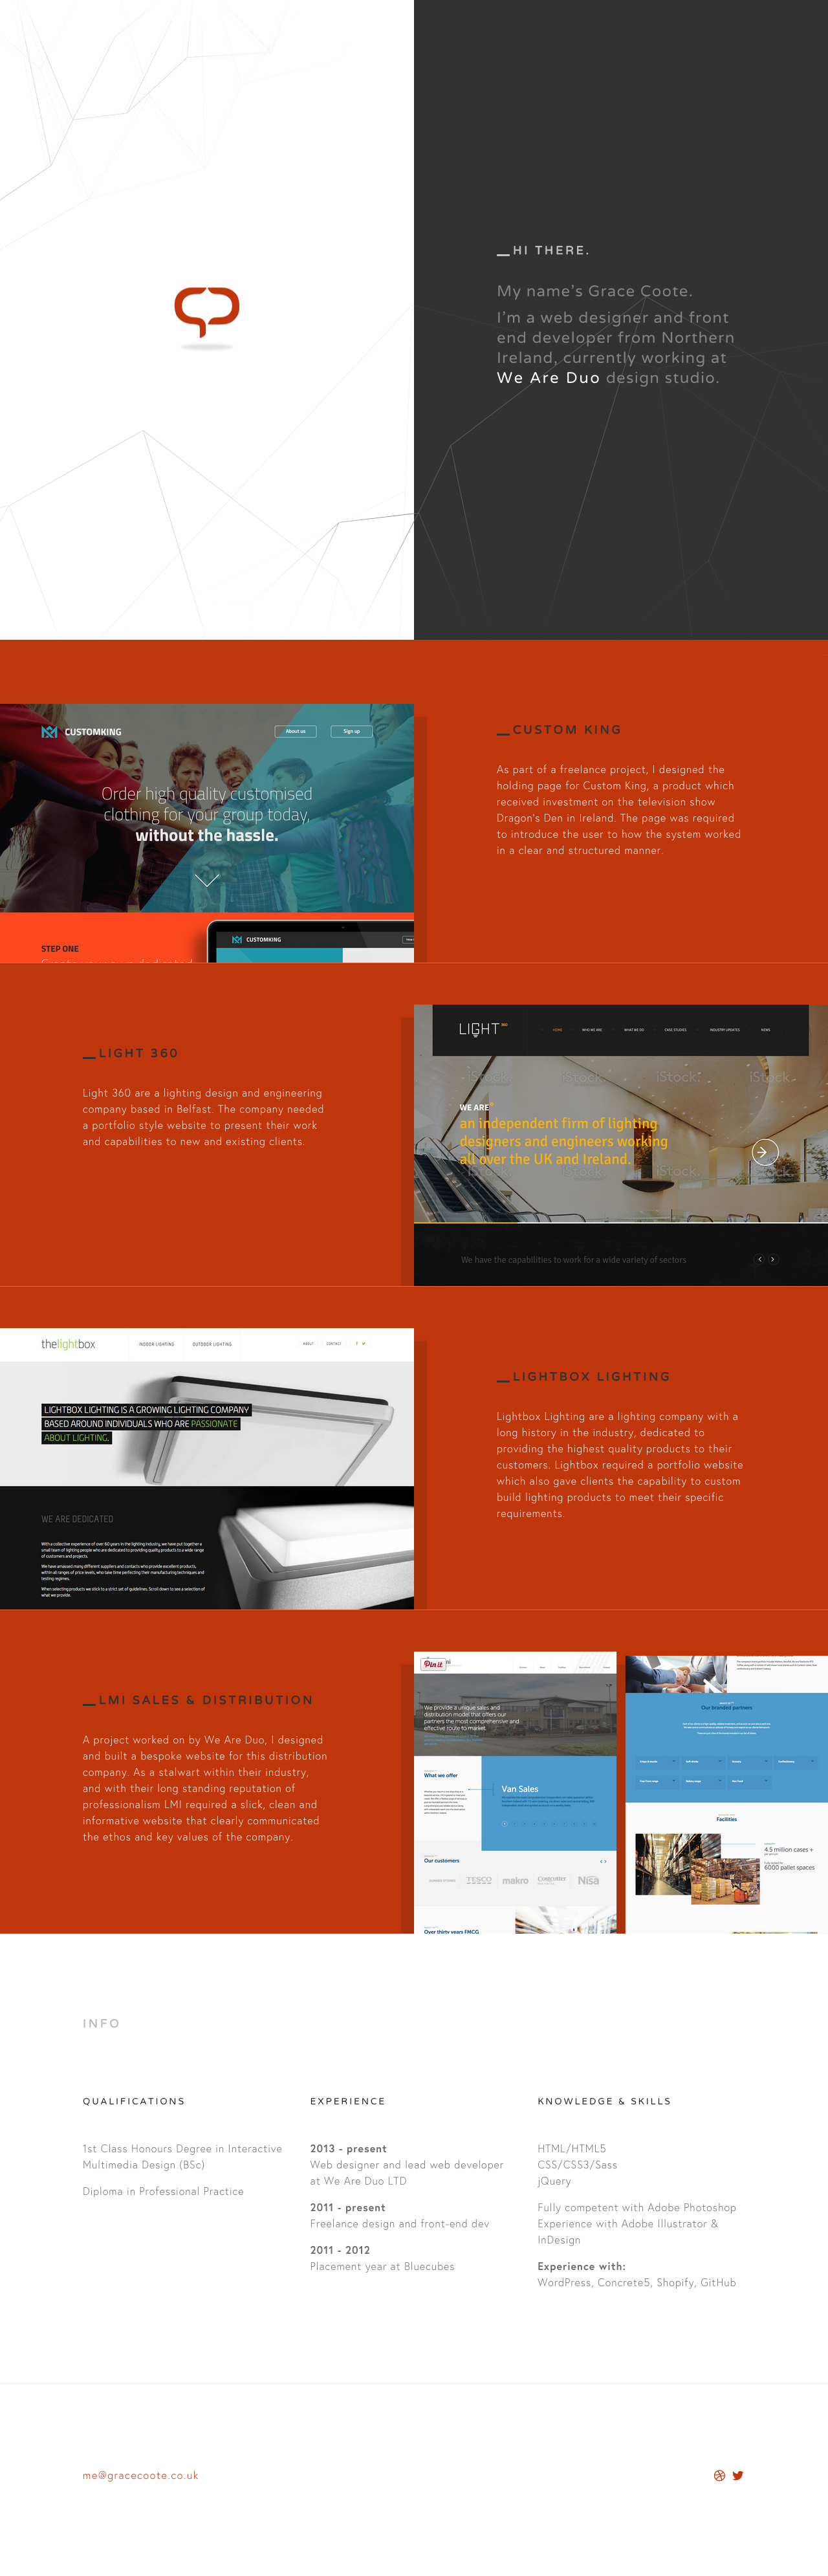 Grace Coote Website Screenshot